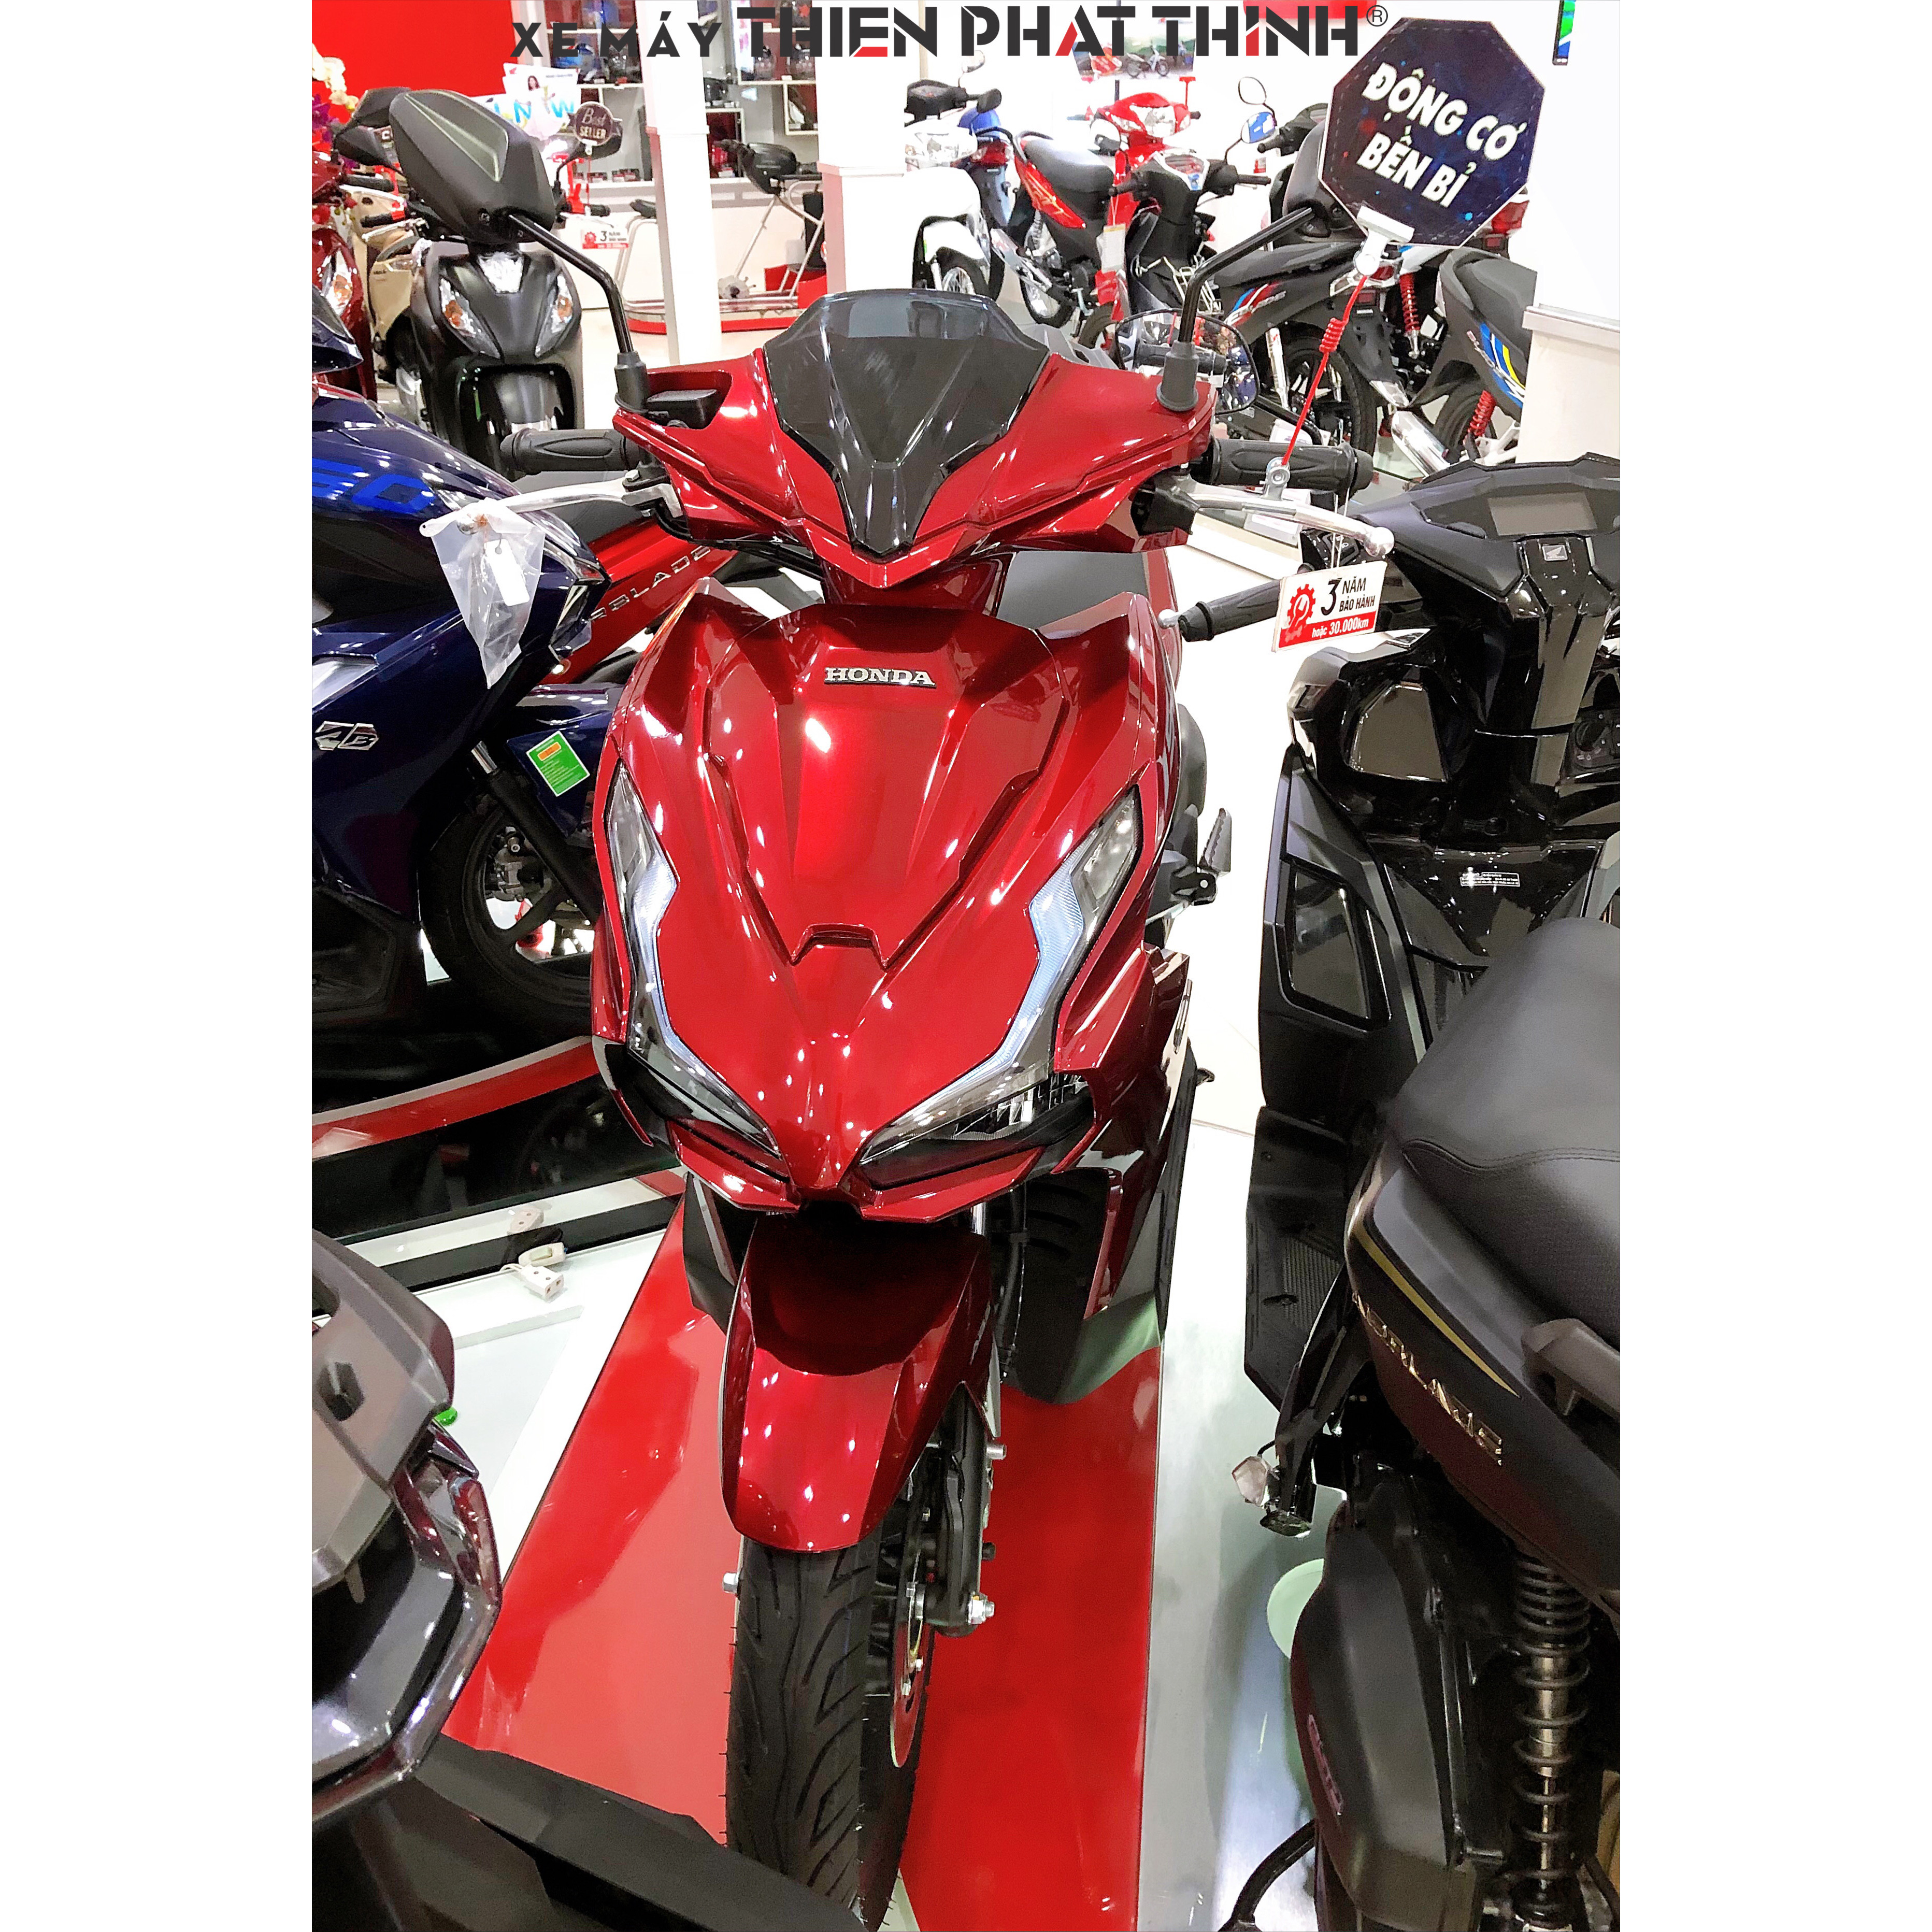 xe máy Honda Air blade 150cc